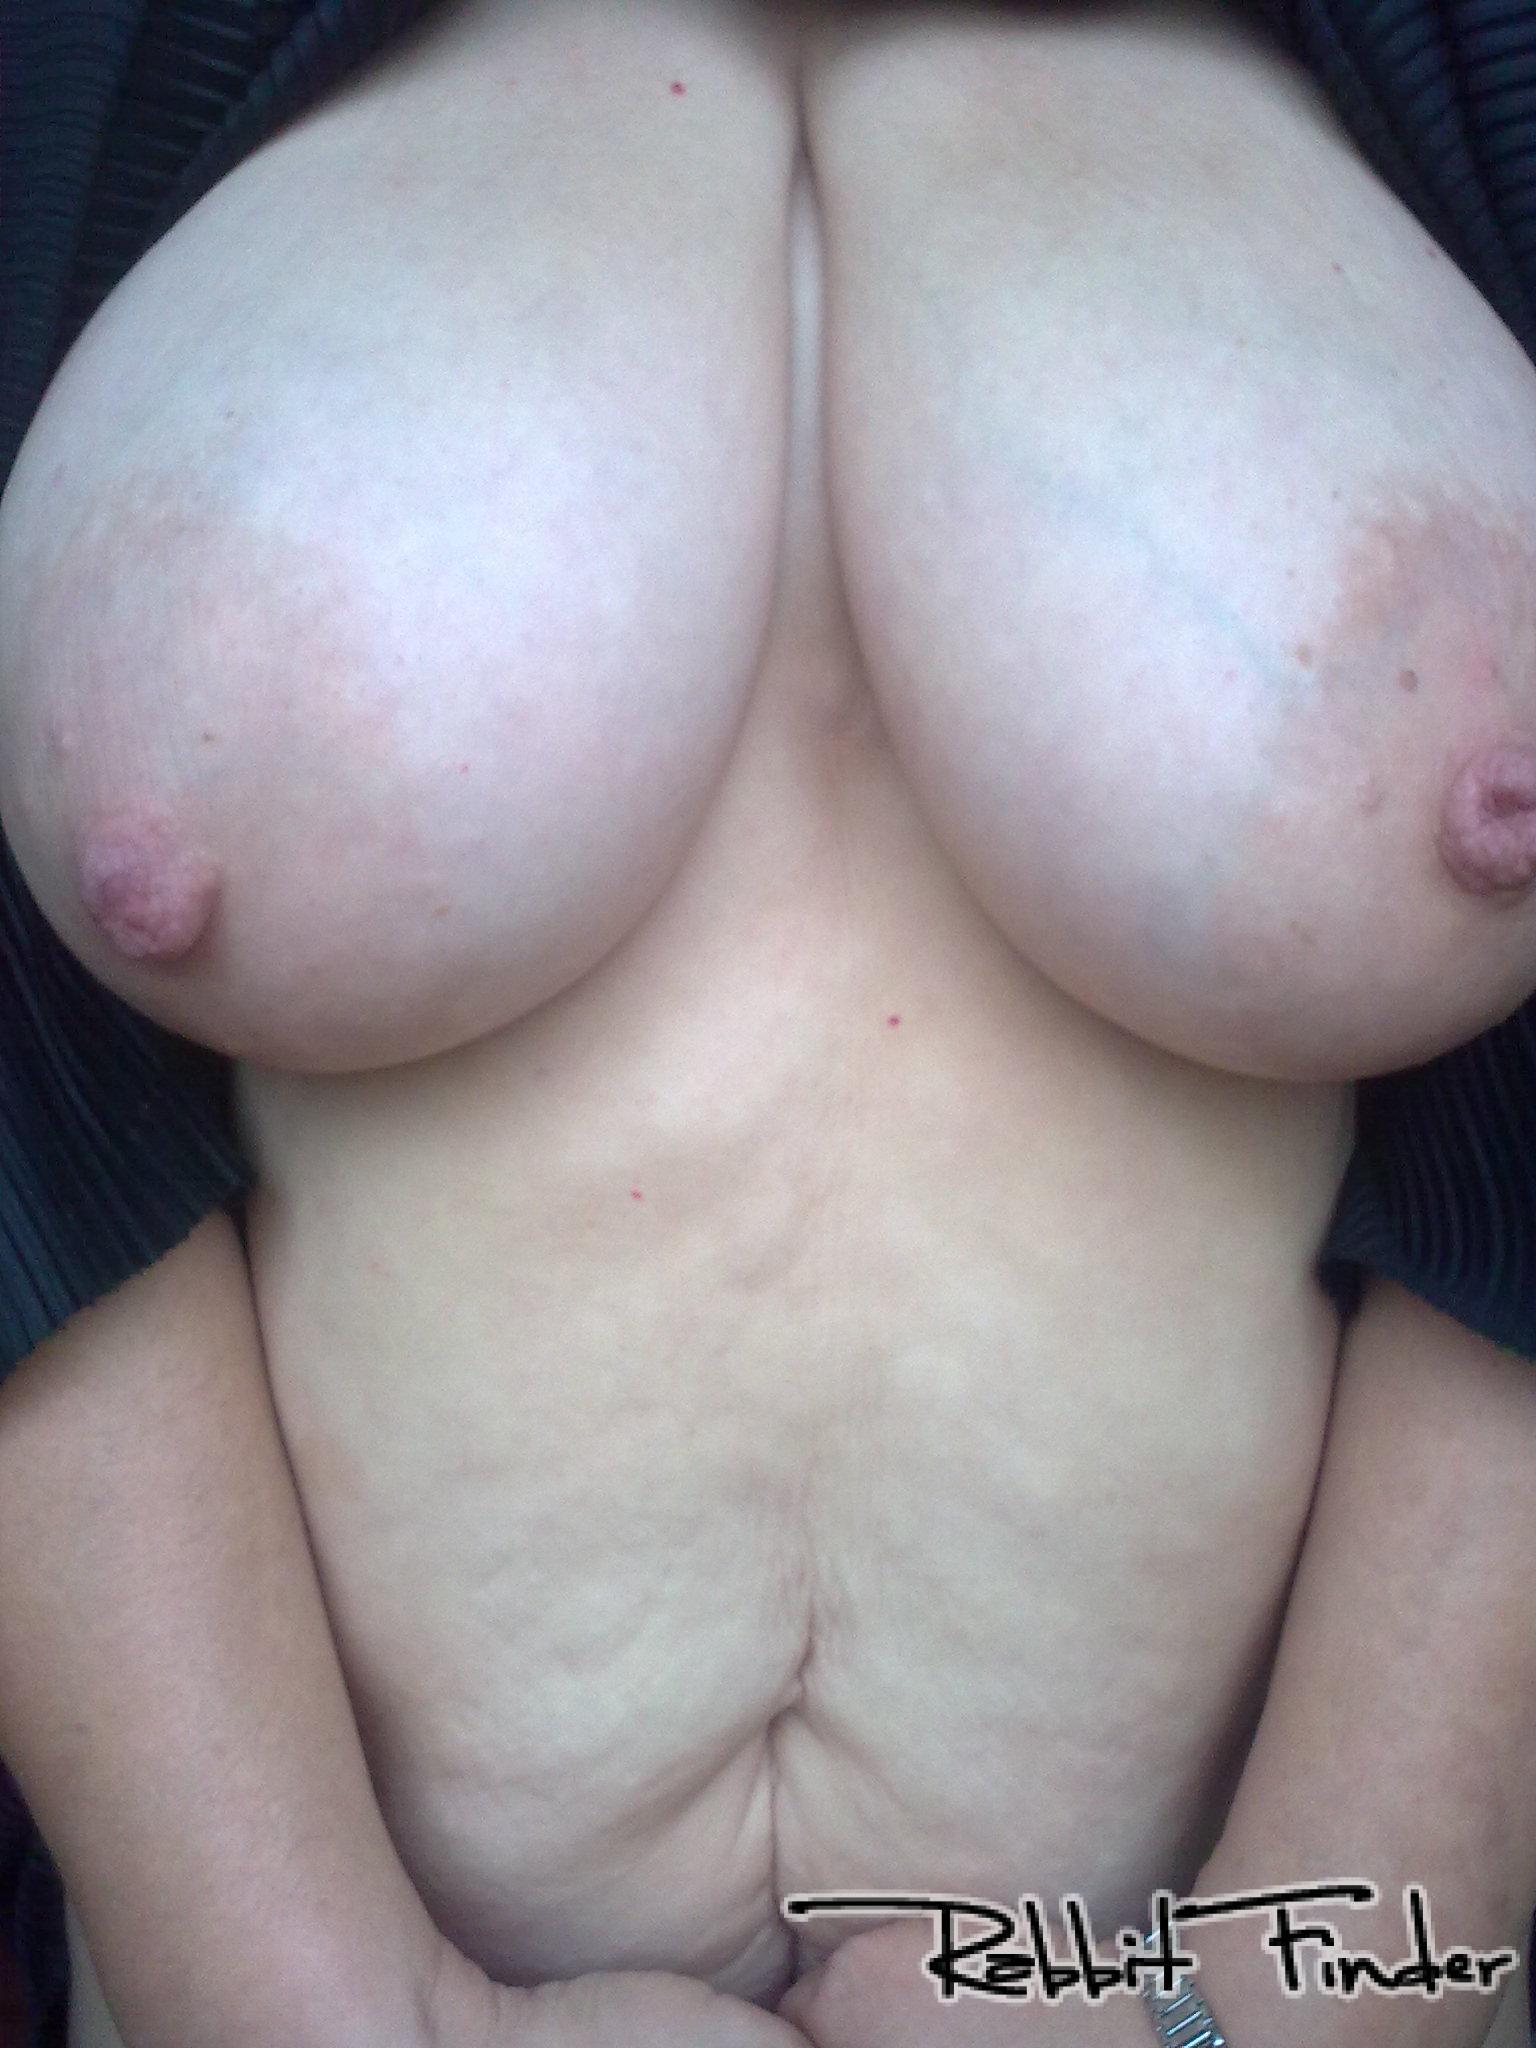 gallerie sexe amateur sexe francais